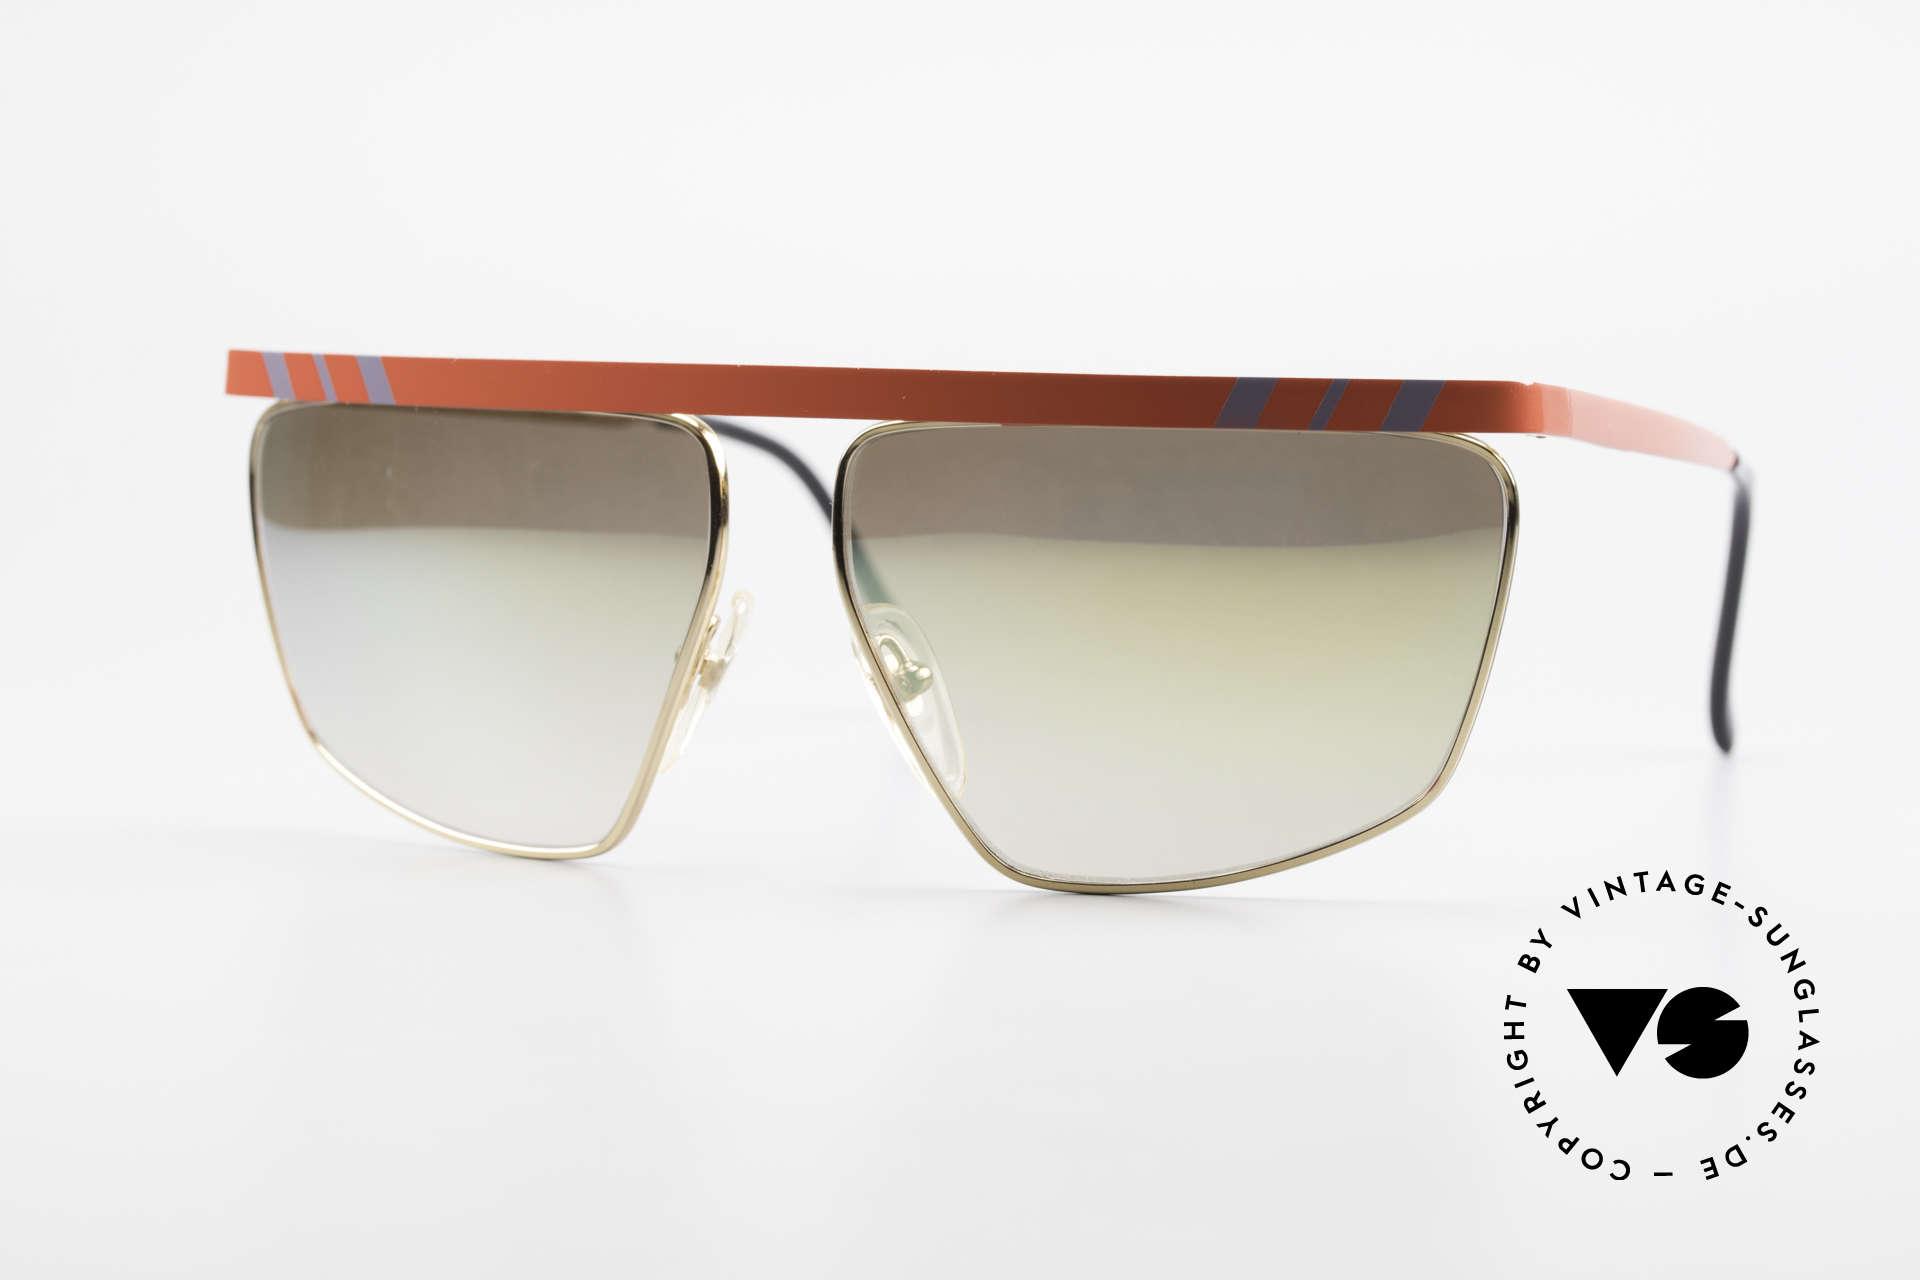 Casanova CN7 Luxury Sunglasses Mirrored, excentric Italian XL sunglasses design by Casanova, Made for Men and Women